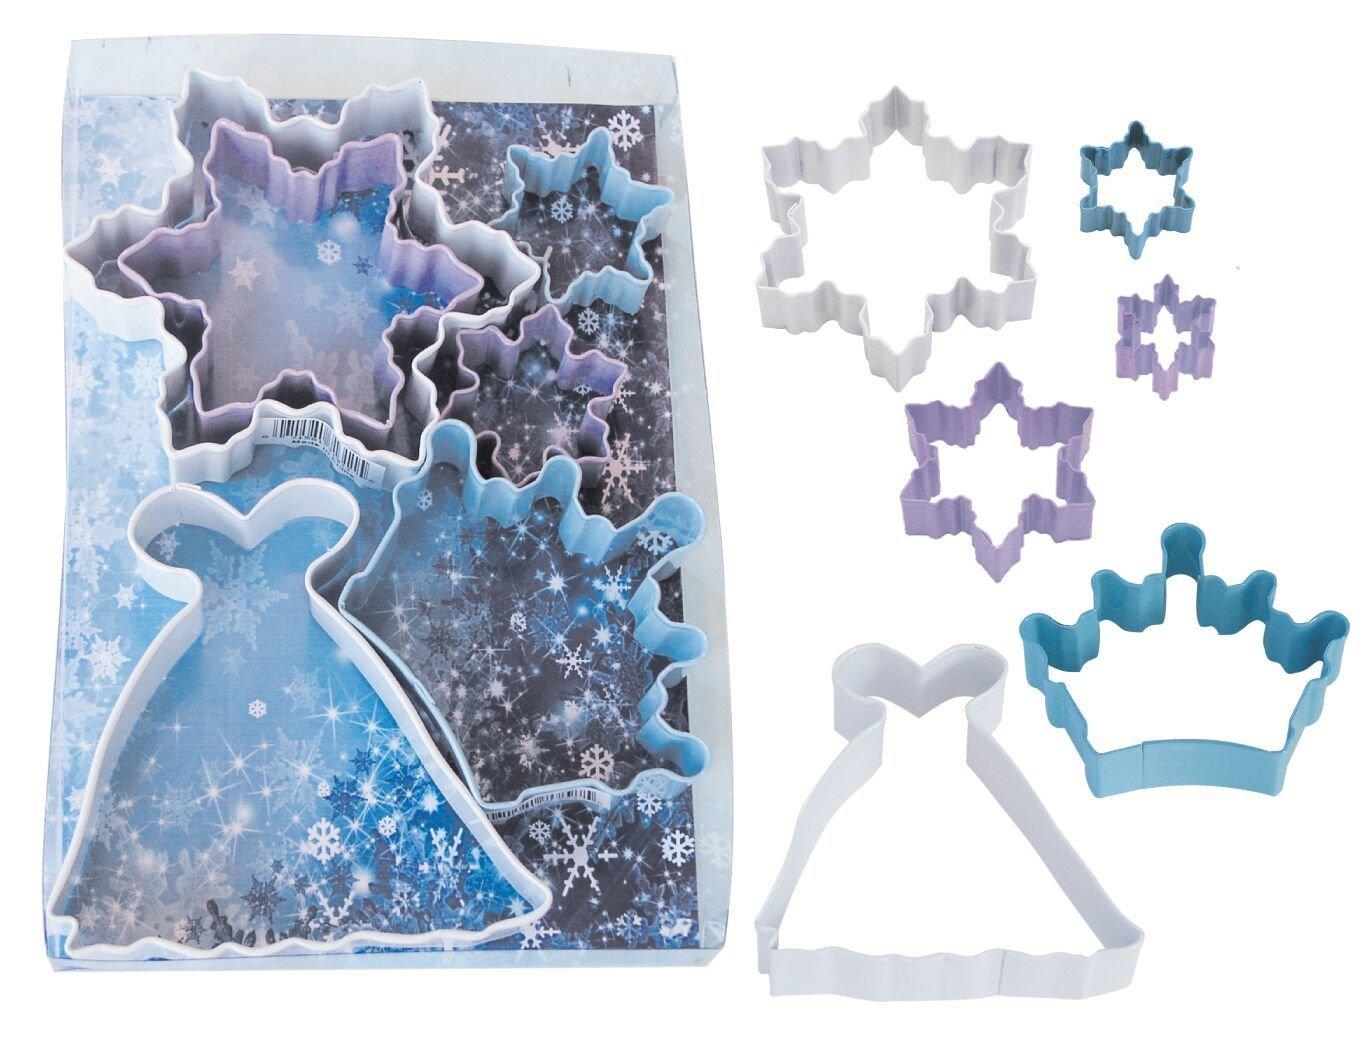 SALE!!! By AH -Set of 6 Cookie Cutters 'SNOW QUEEN' -Κουπάτ Βασίλισσα του Χιονιού -σετ με 6 τεμ.